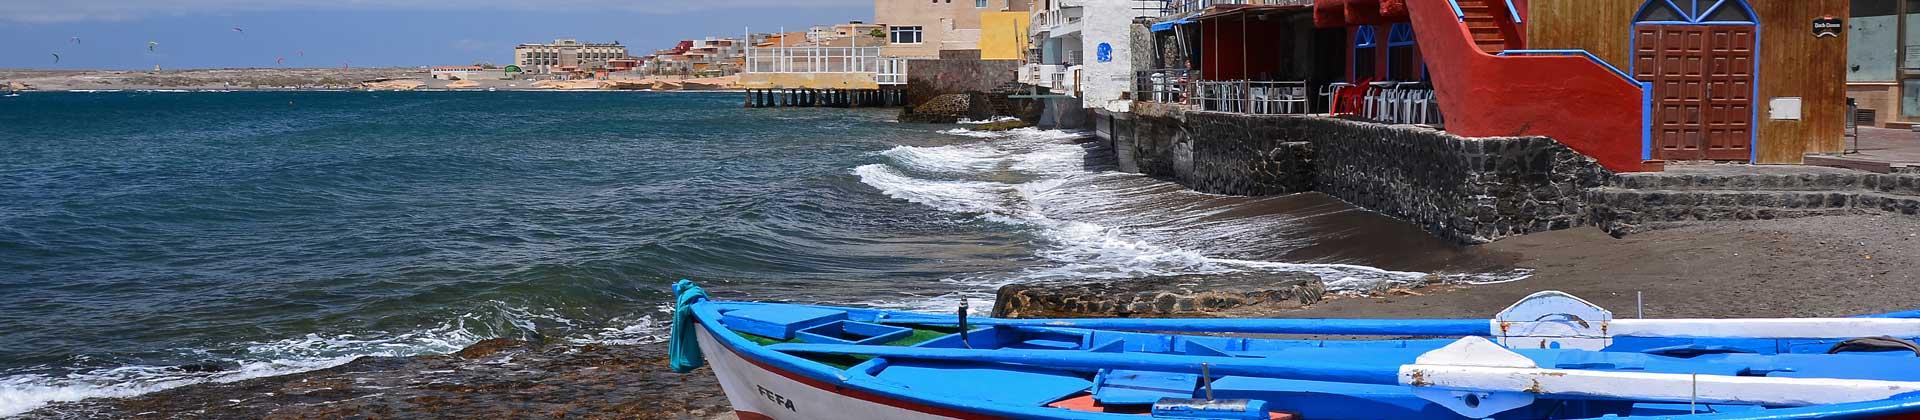 https://www.goodmorningtenerife.com/wp-content/uploads/2014/08/01_slide_landscape_GM_Tenerife.jpg